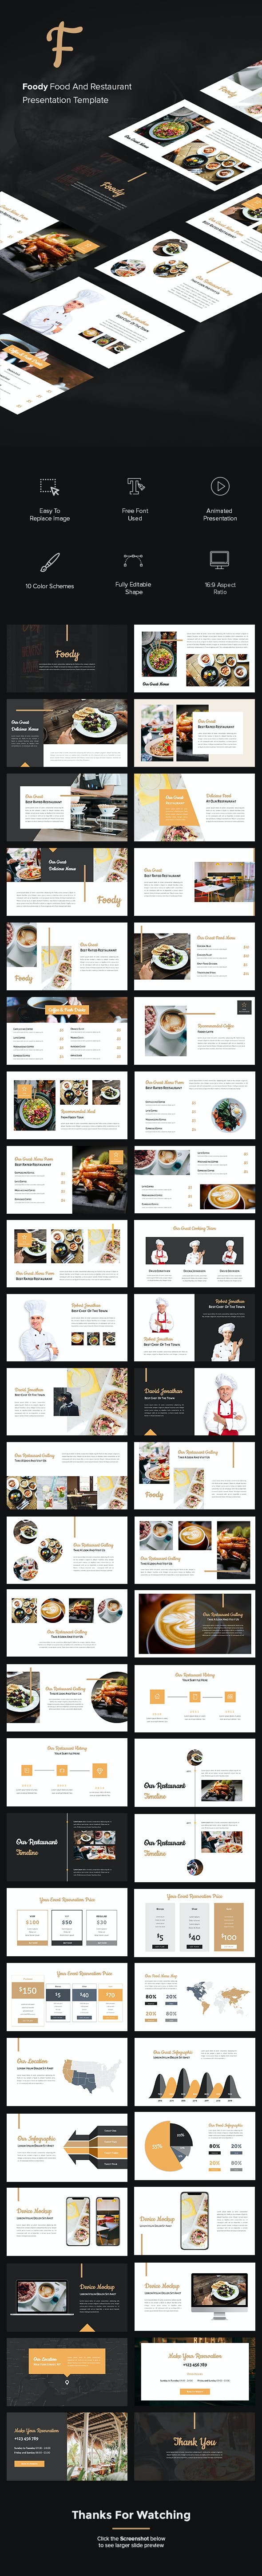 Foody - Food And Restaurant Keynote Template